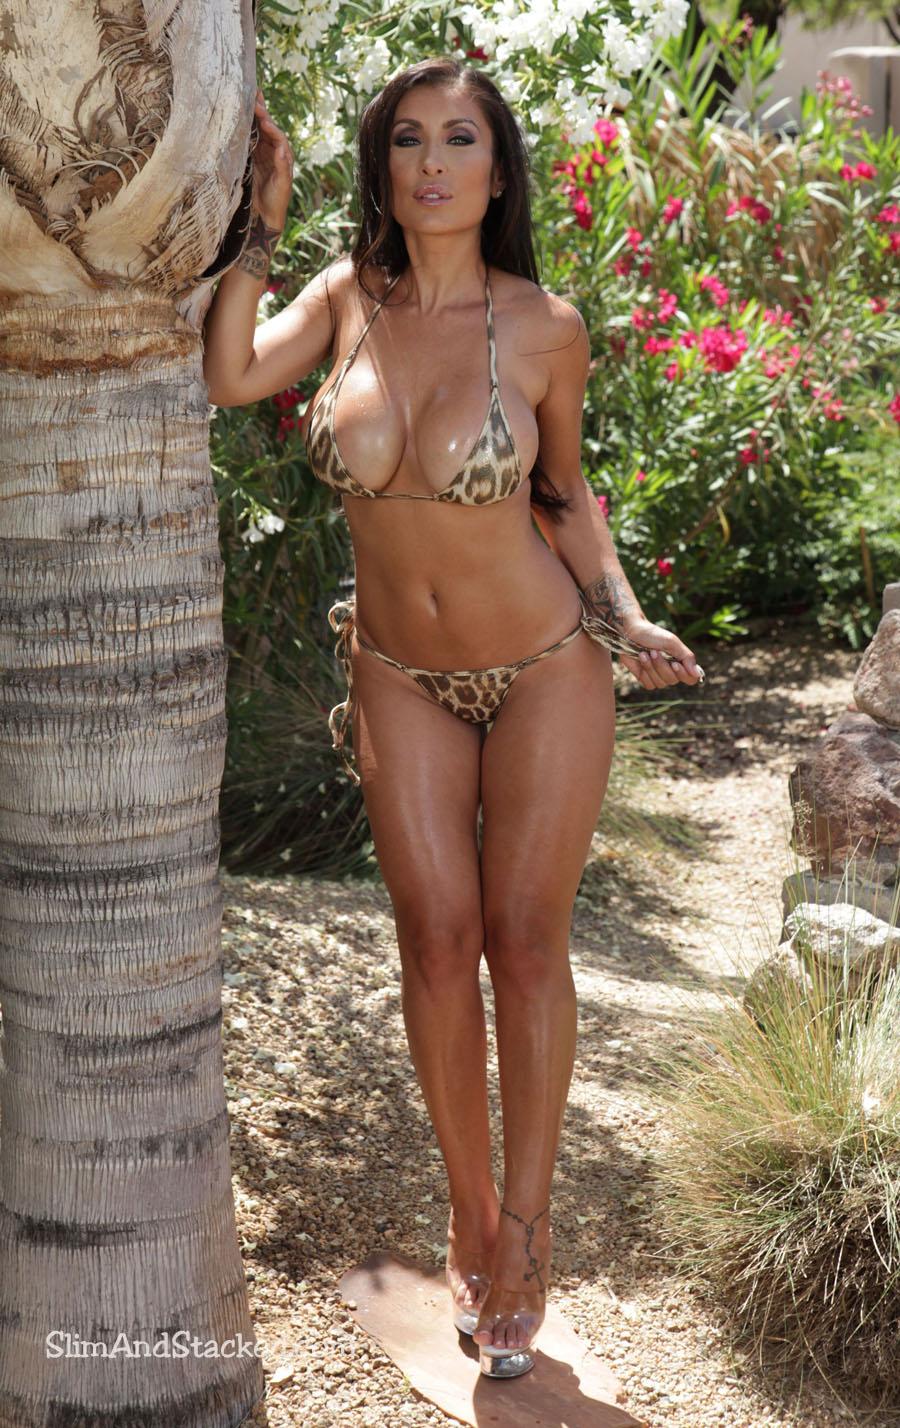 Jessica canizales in tiny bikini